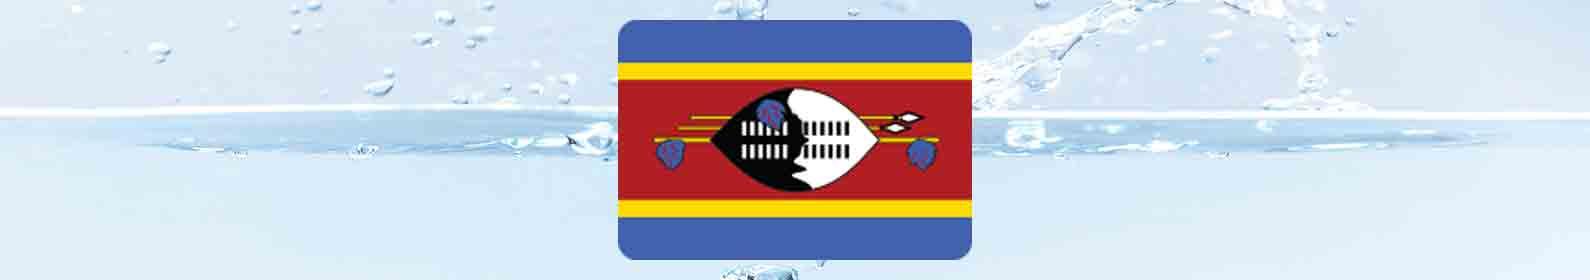 water-treatment-swaziland.jpg